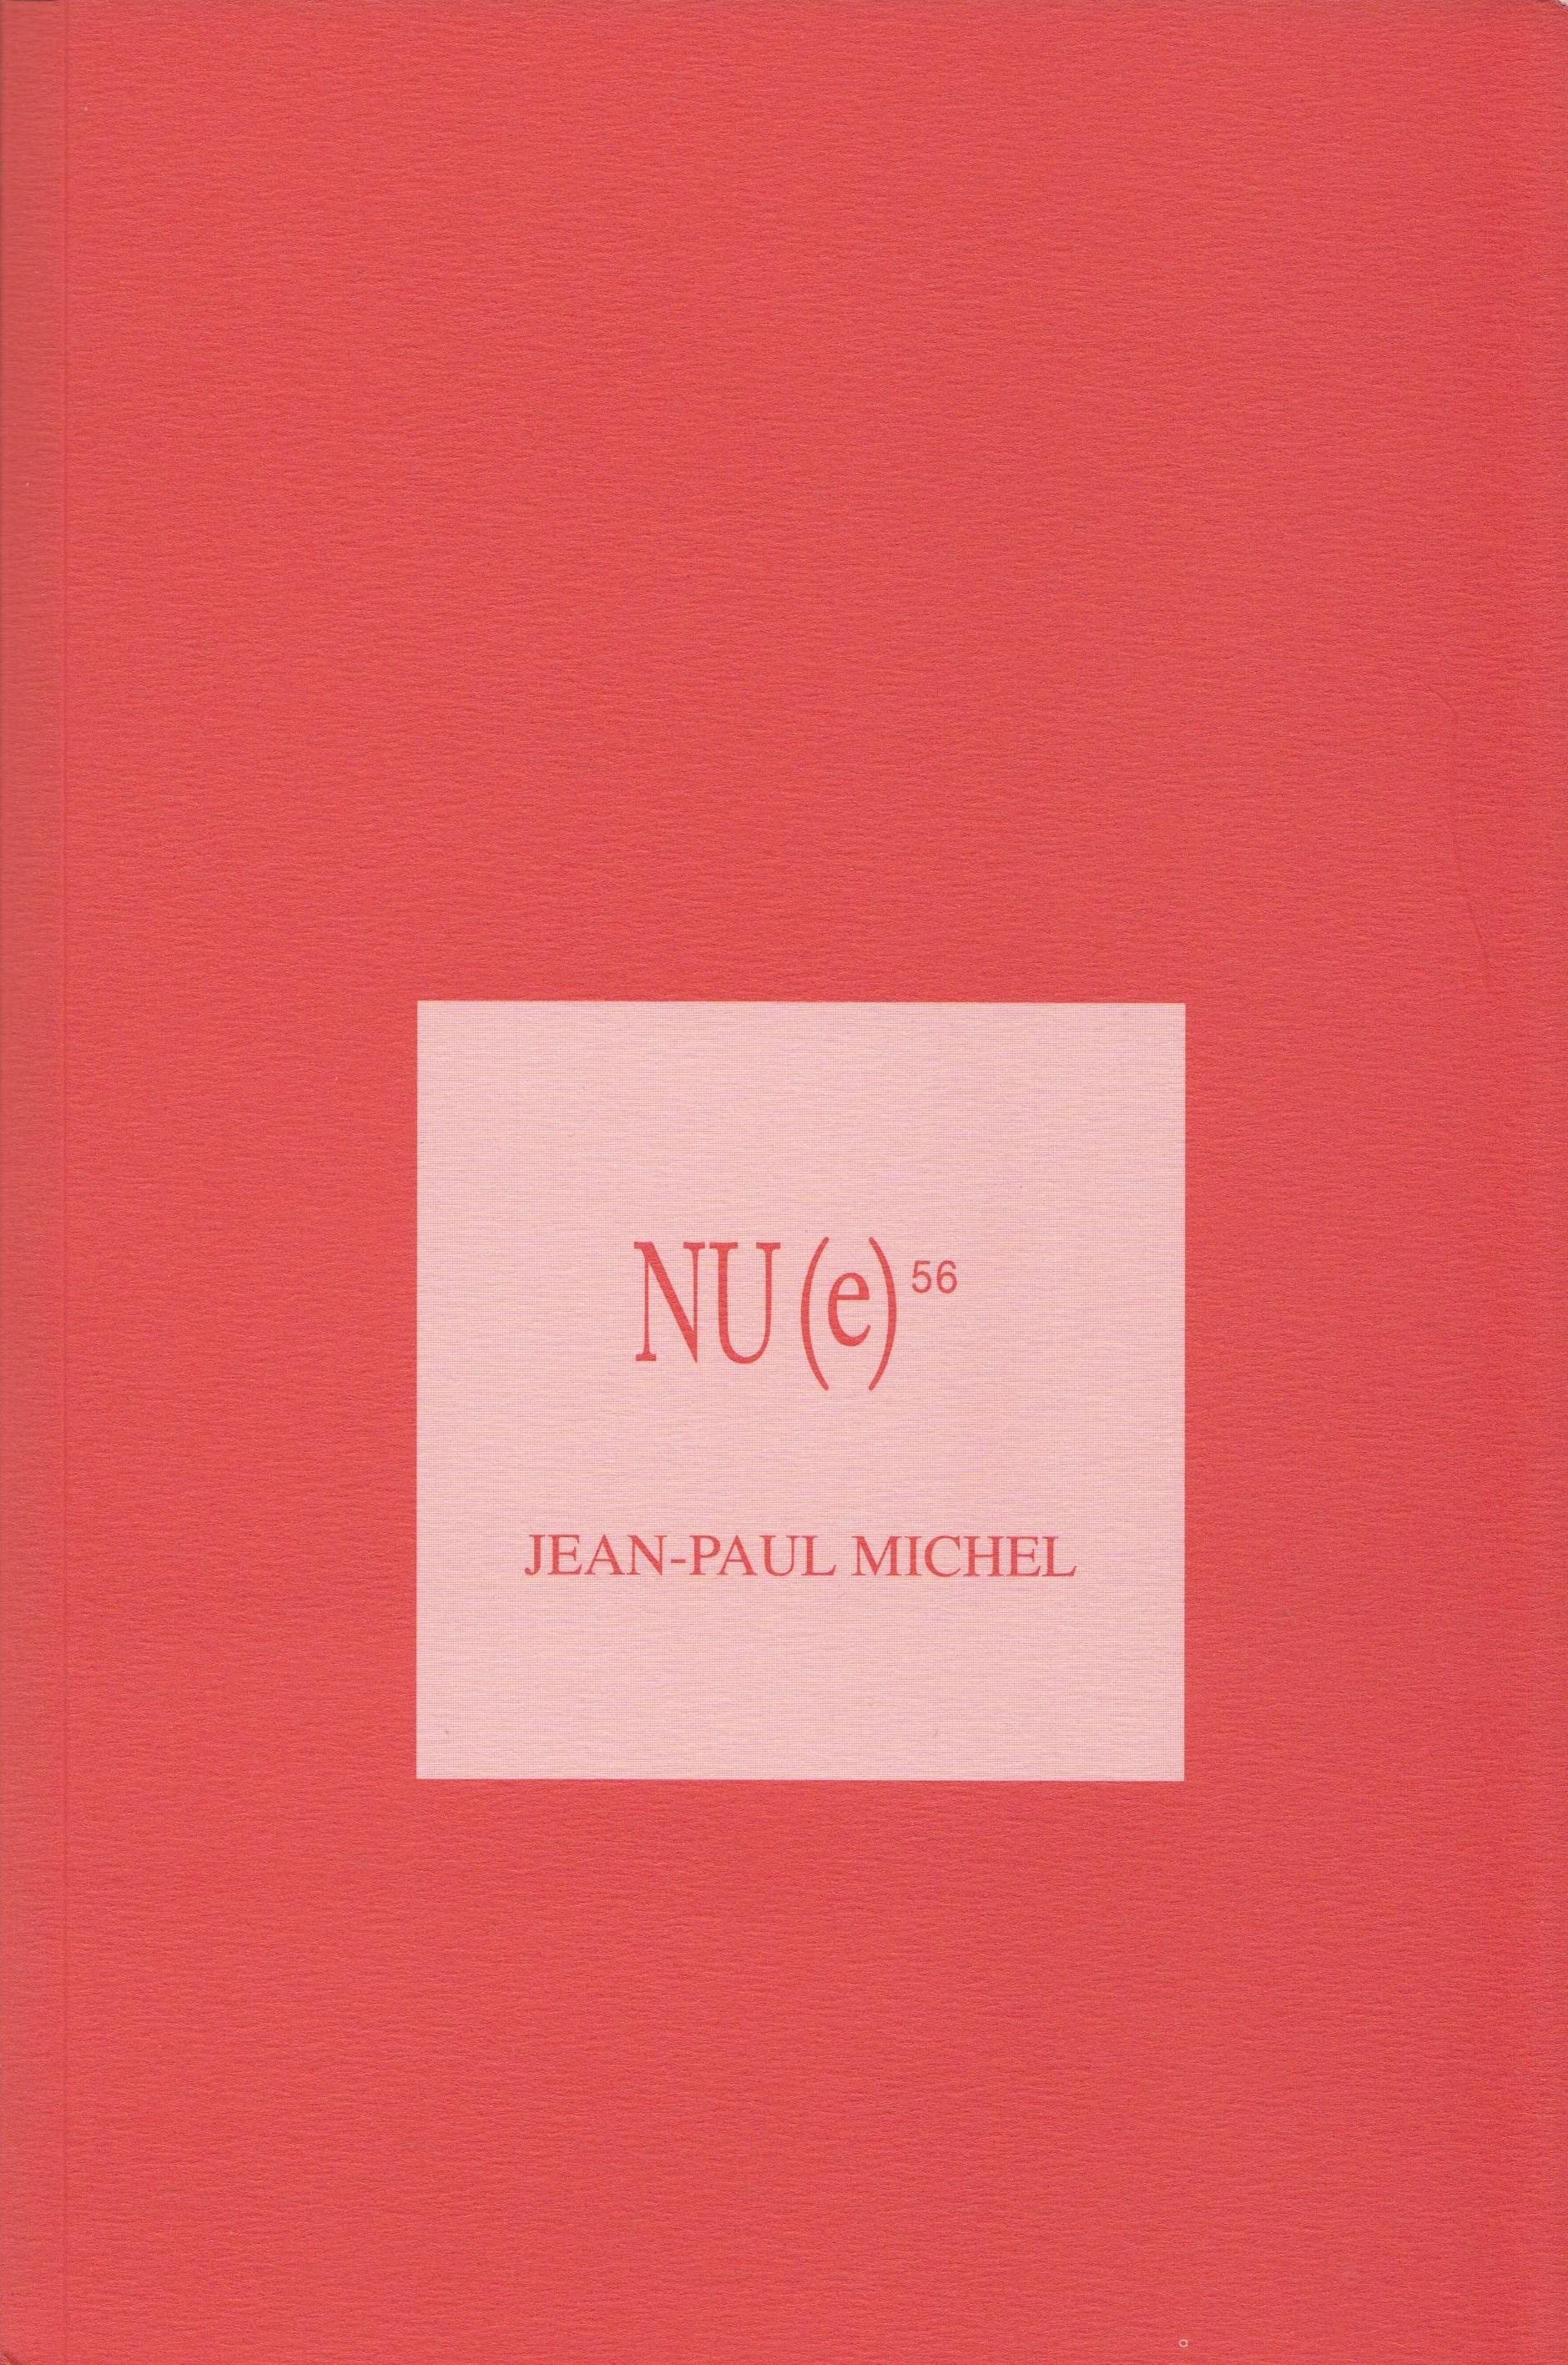 Nu(e), n°56: Jean-Paul Michel (M. Gosztola, dir.)